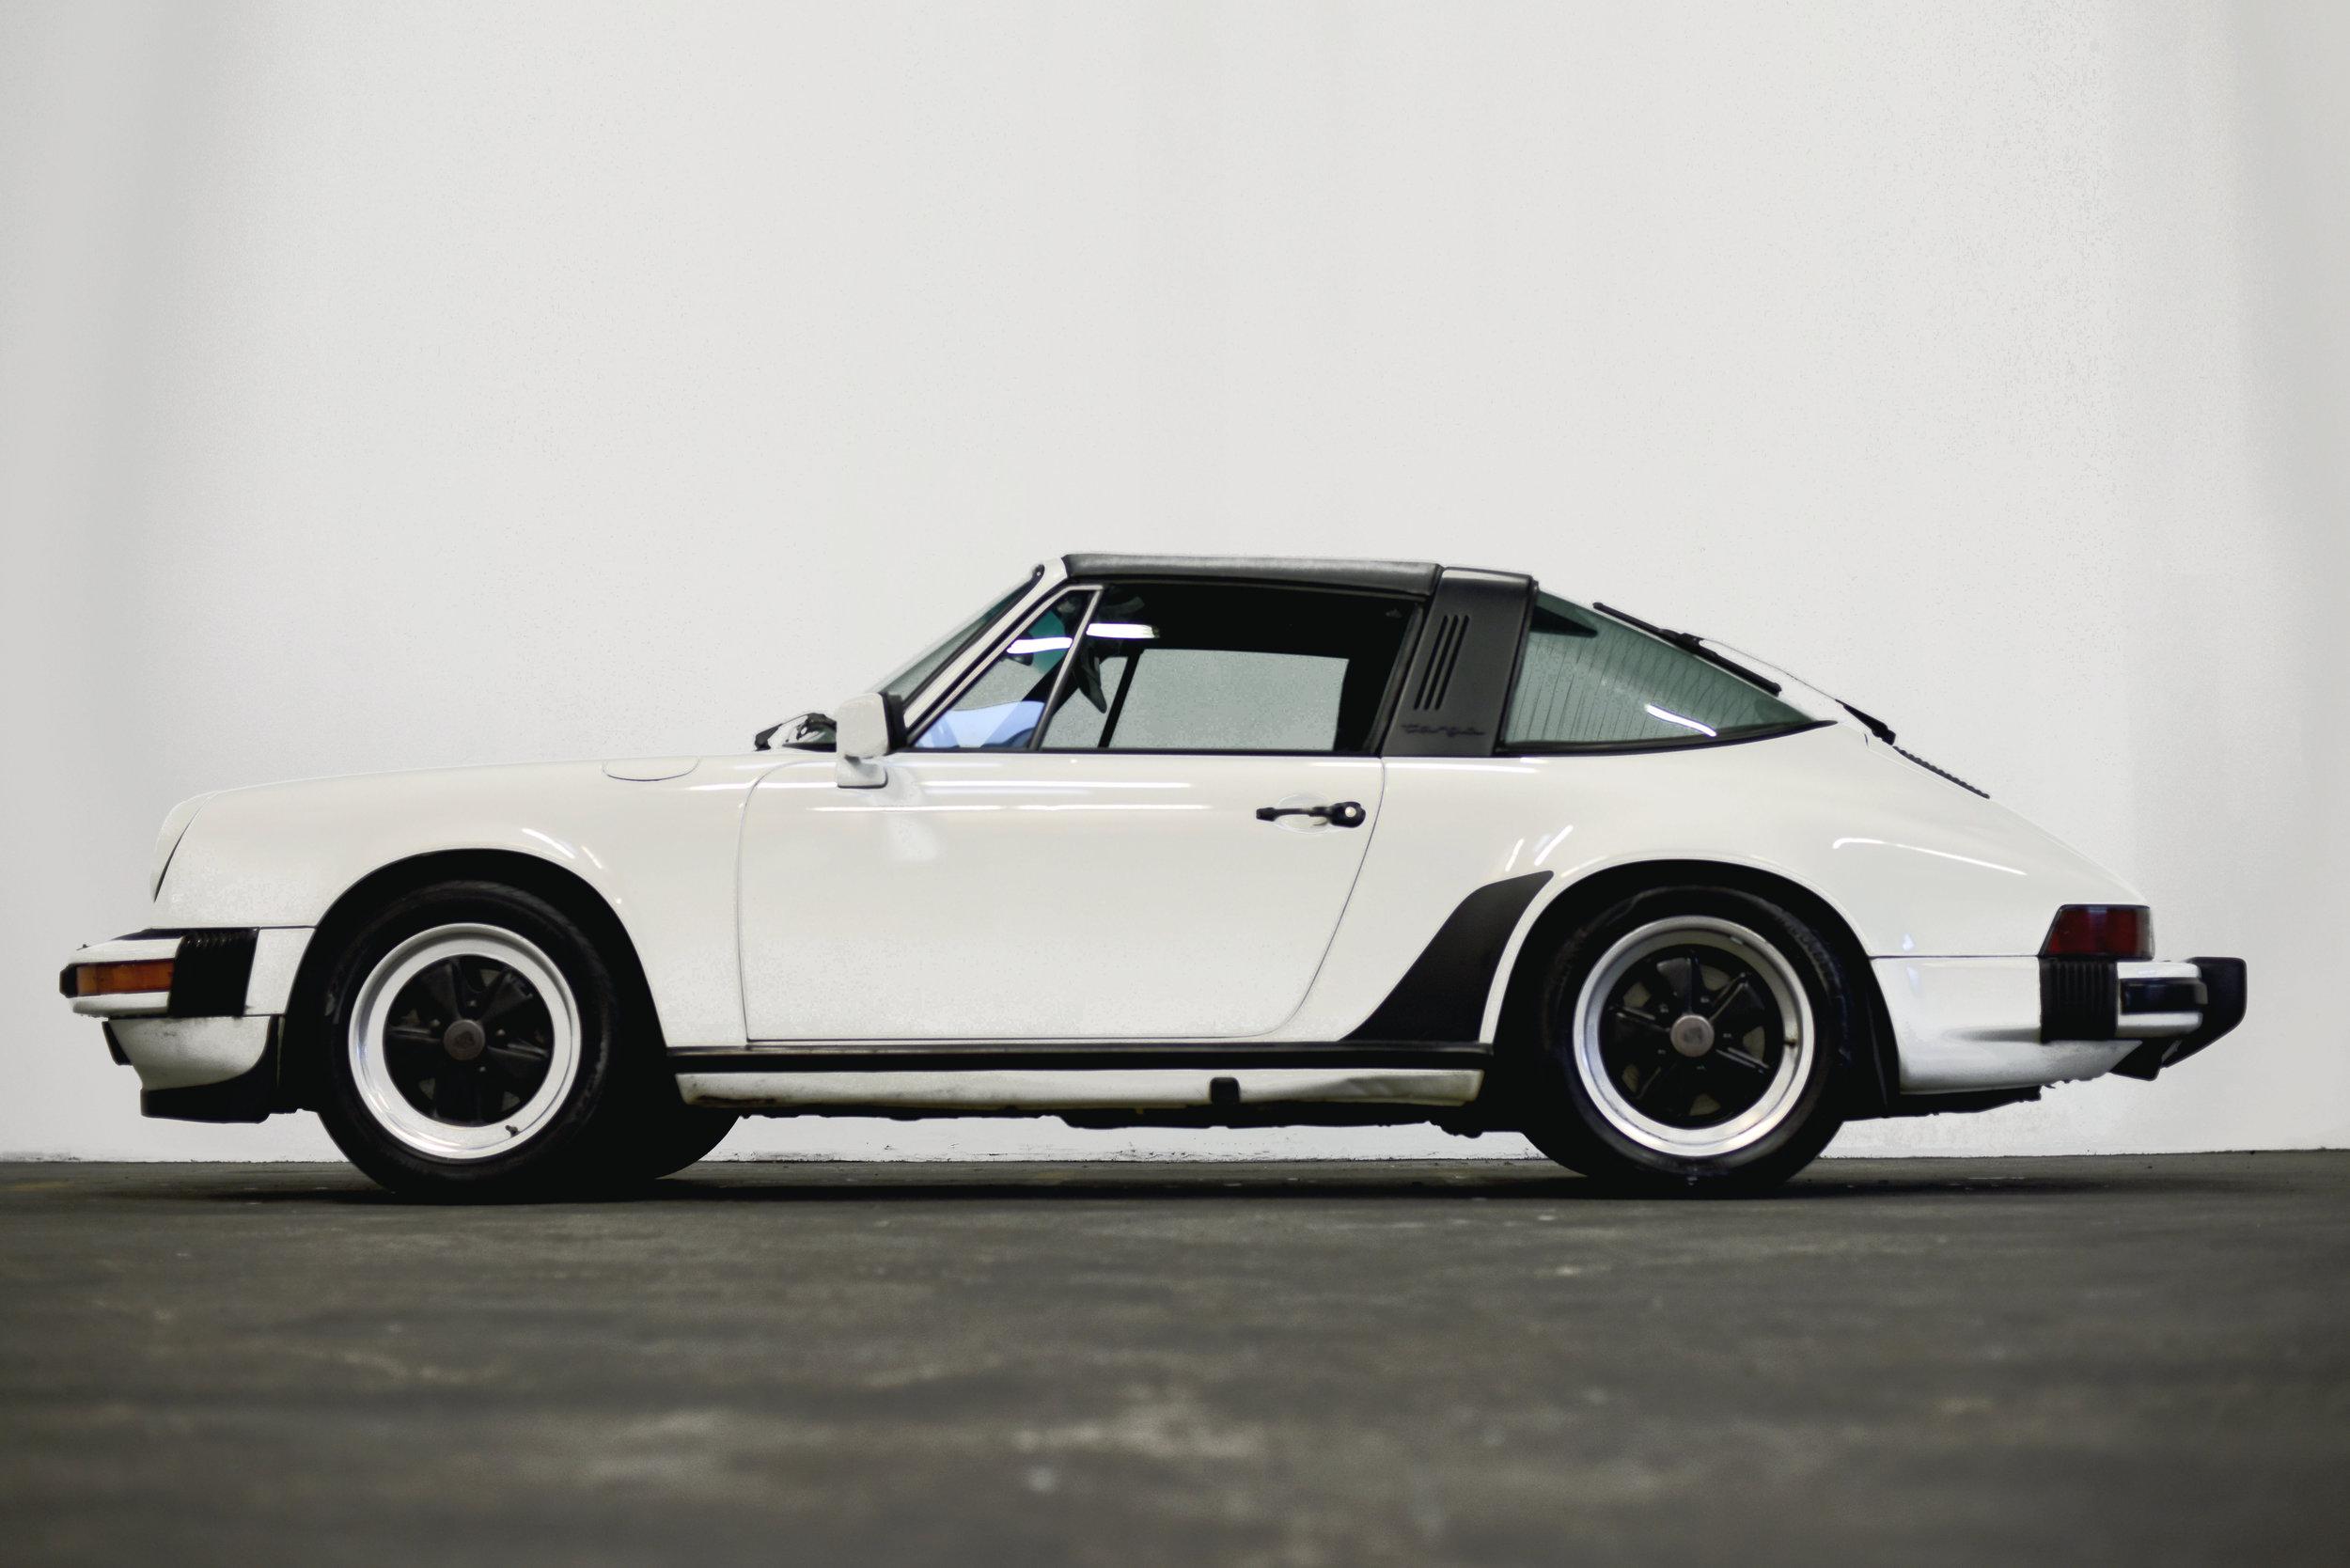 1986 Porsche 911 Targa - Sold March 10, 2019